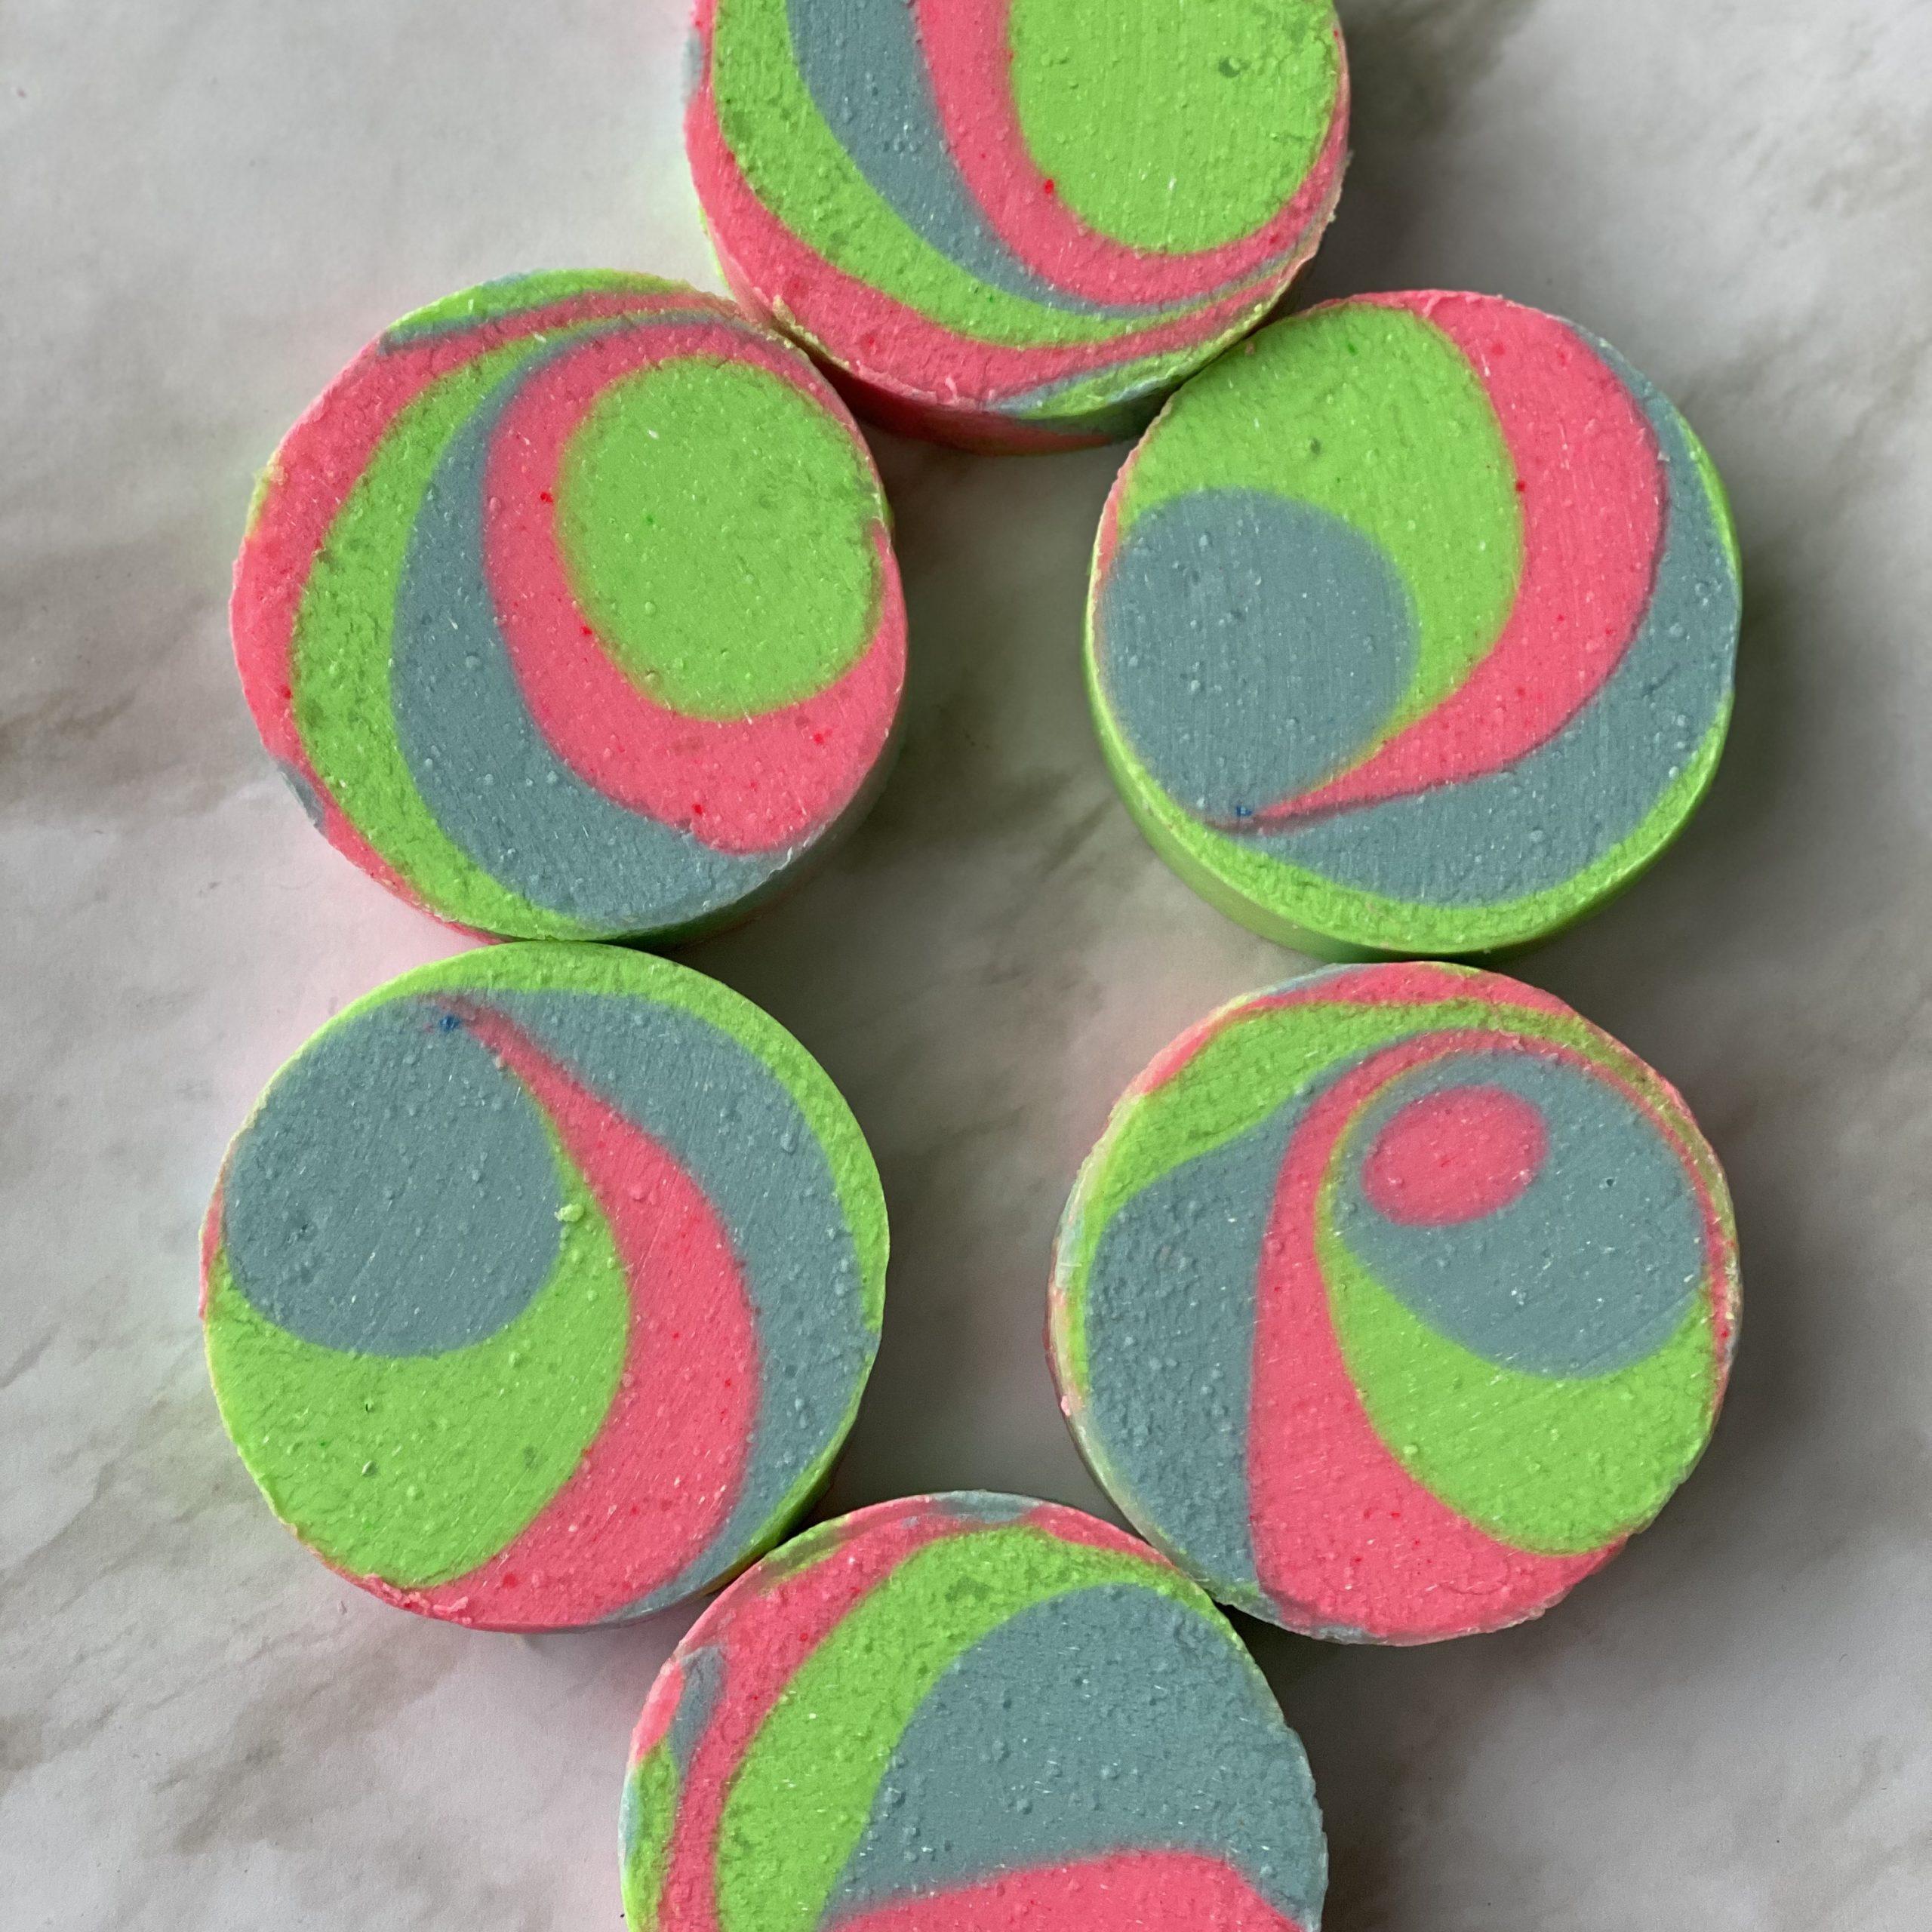 lollipop in neon